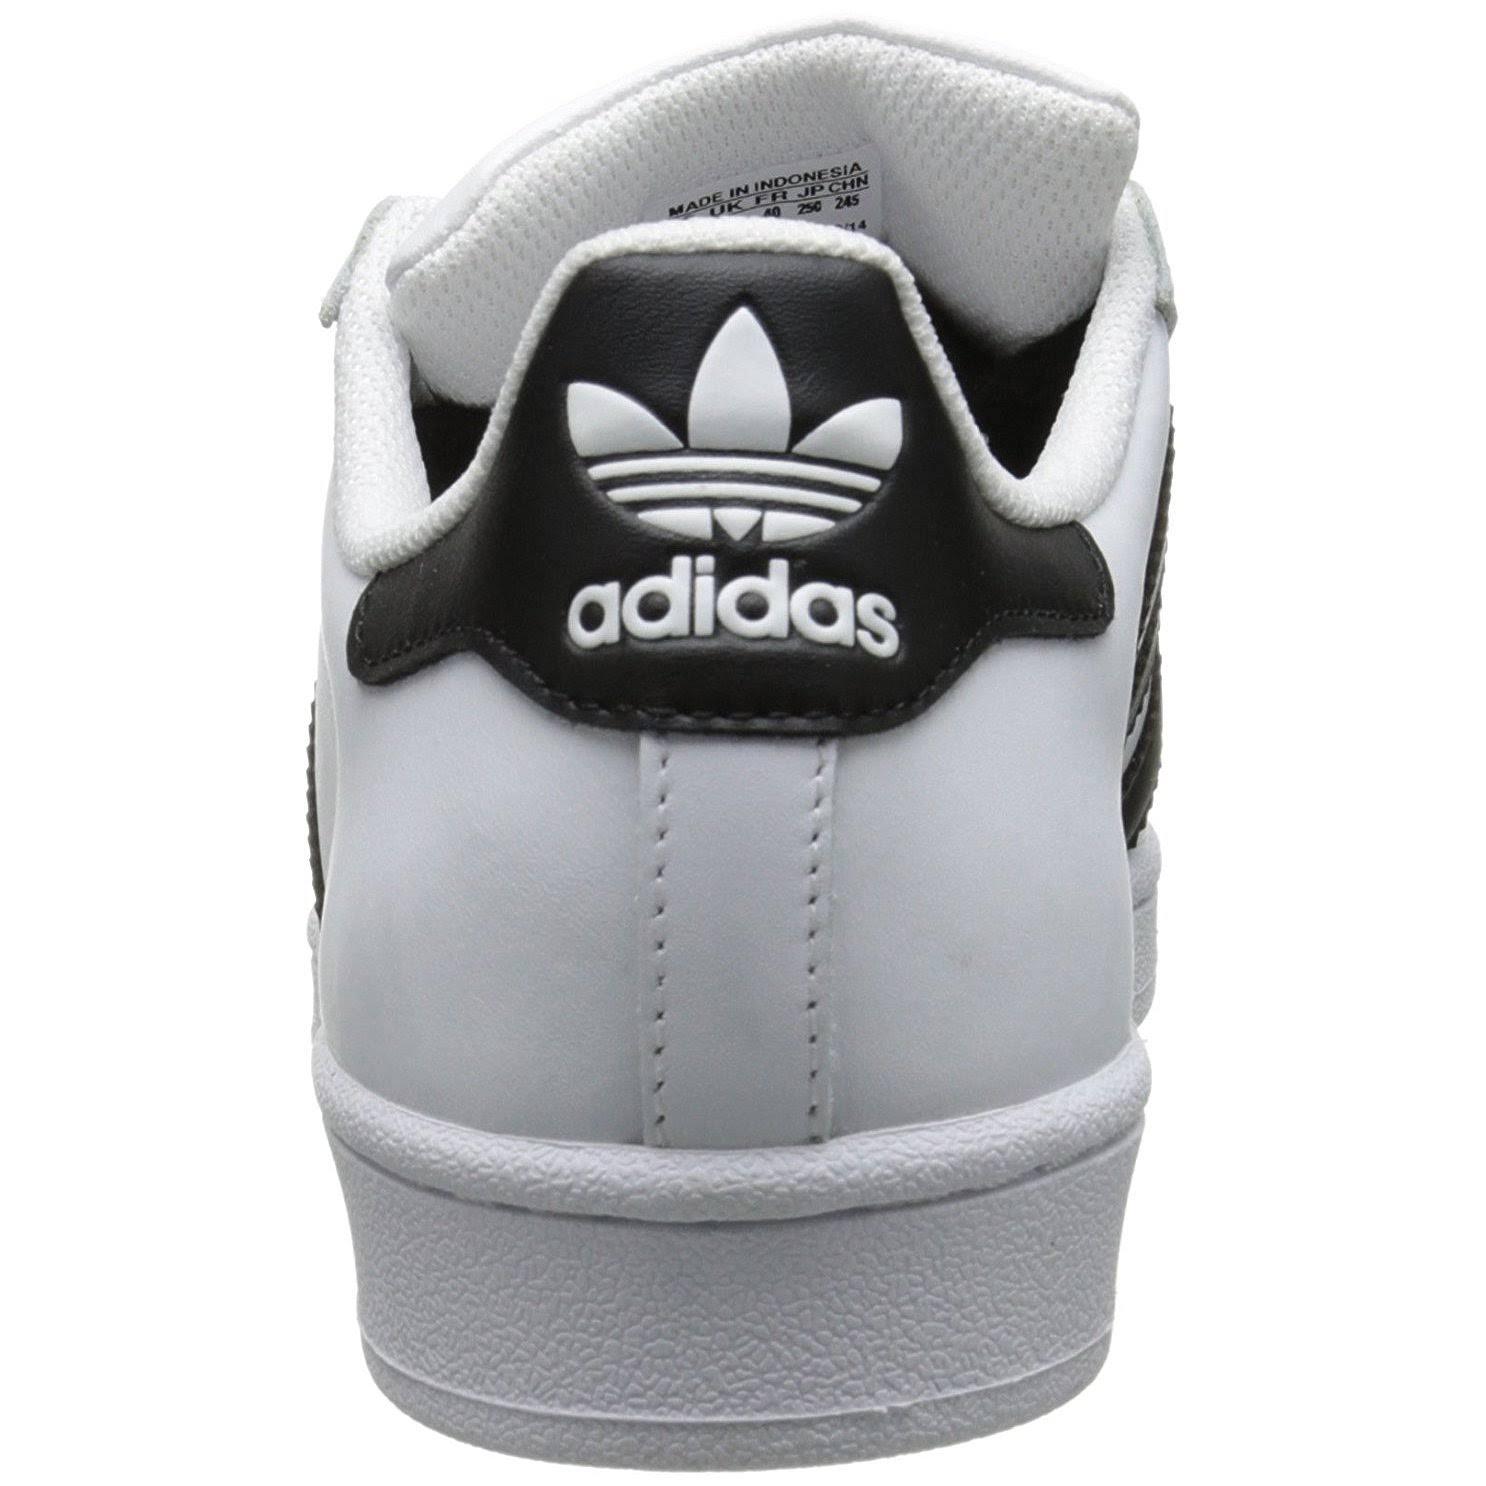 Adidas Superstar Womens C77153 white black Shoes Originals White rpOqwr